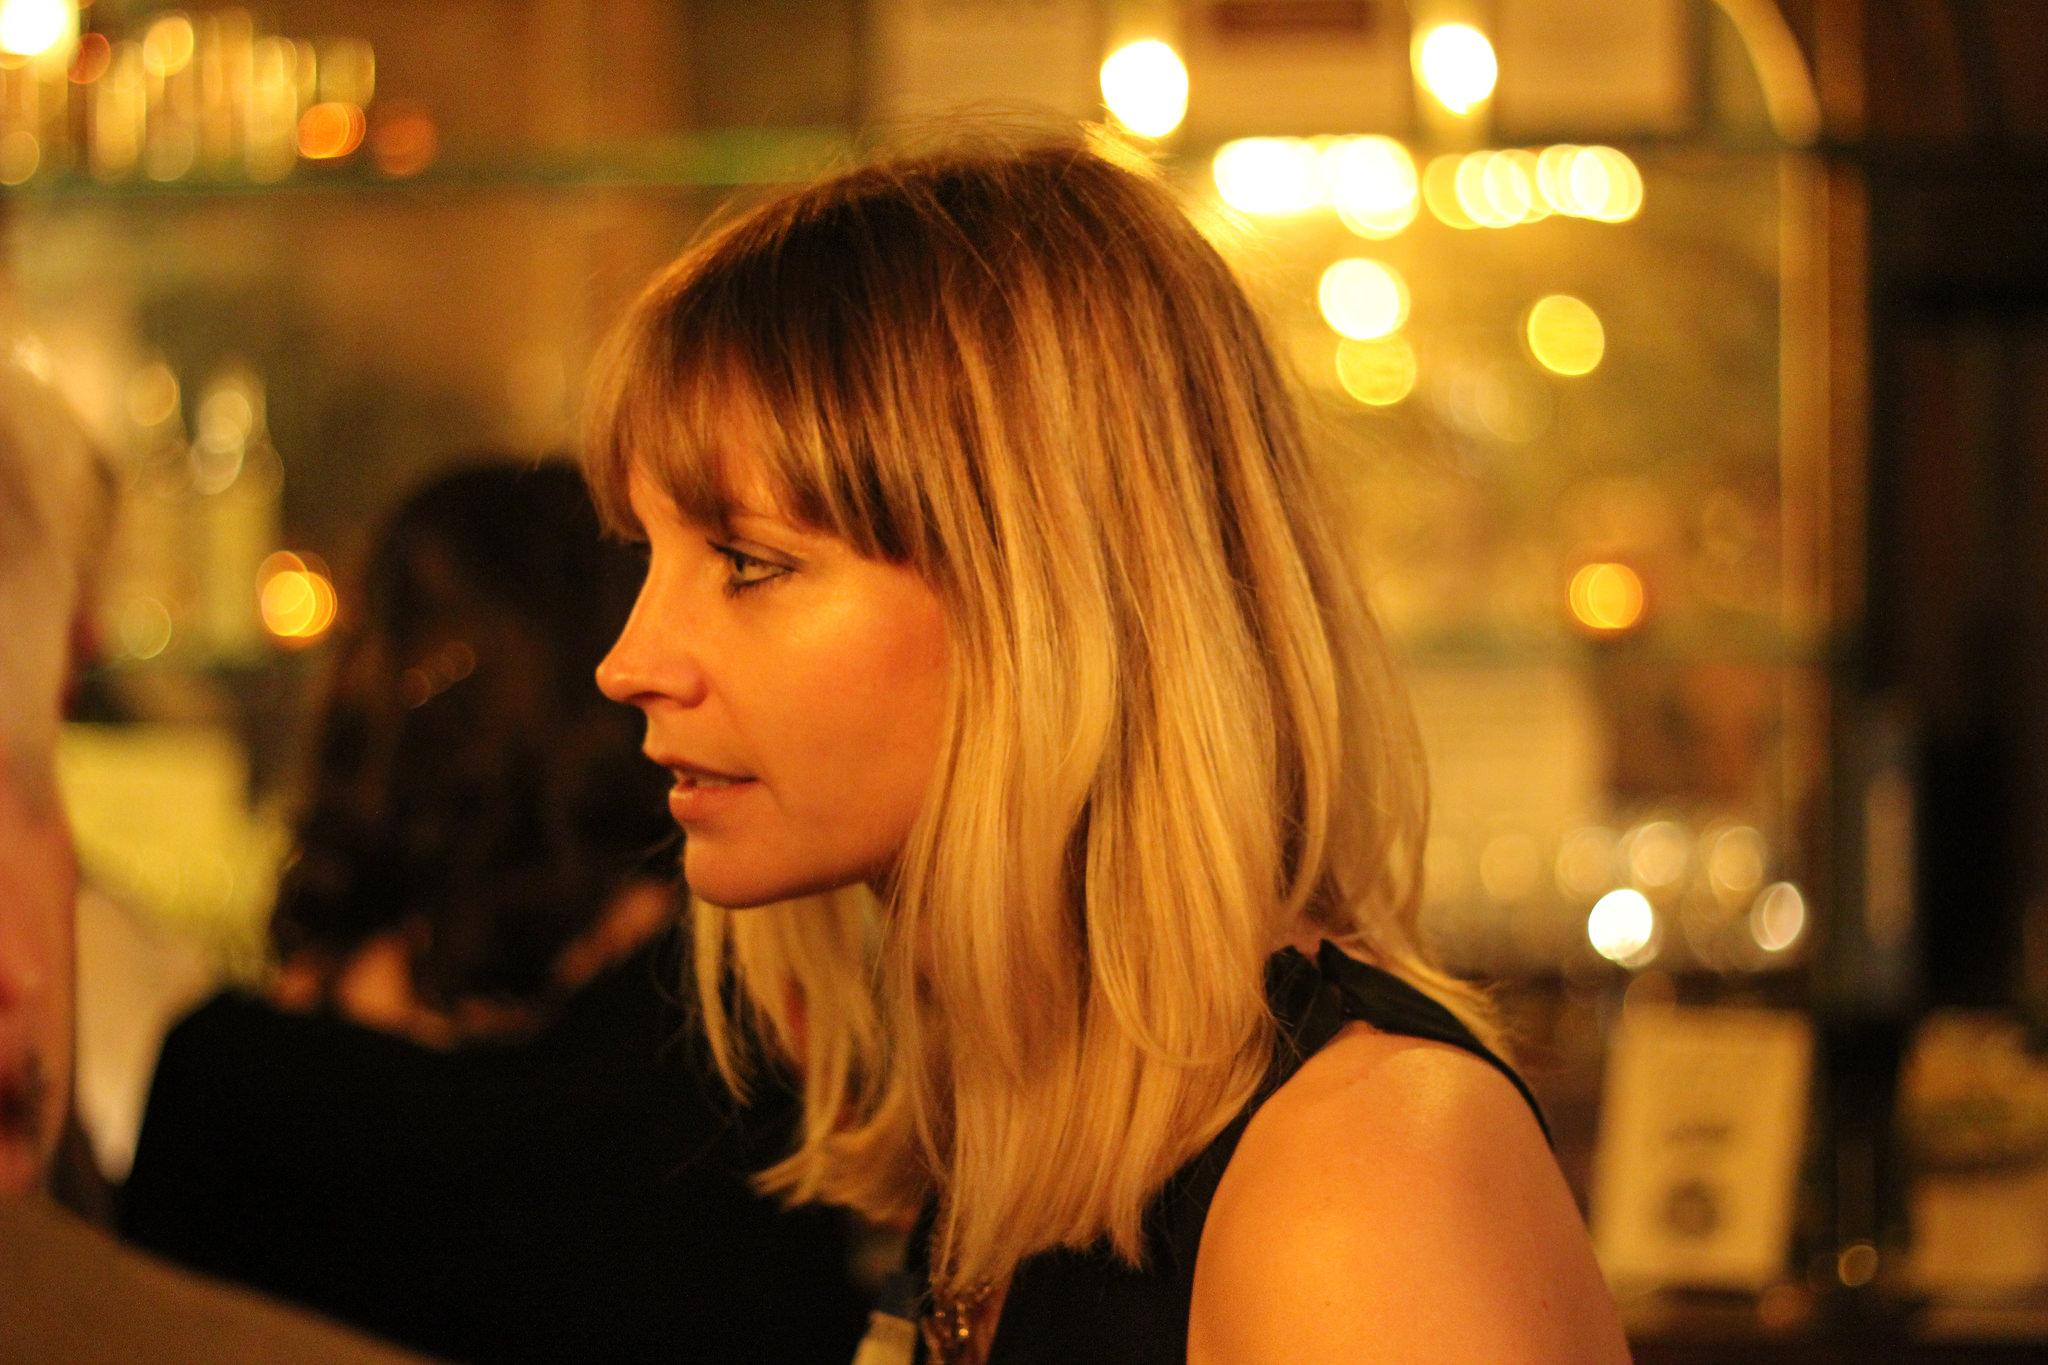 @ELIZABETH ROGER PHOTOGRAPHY